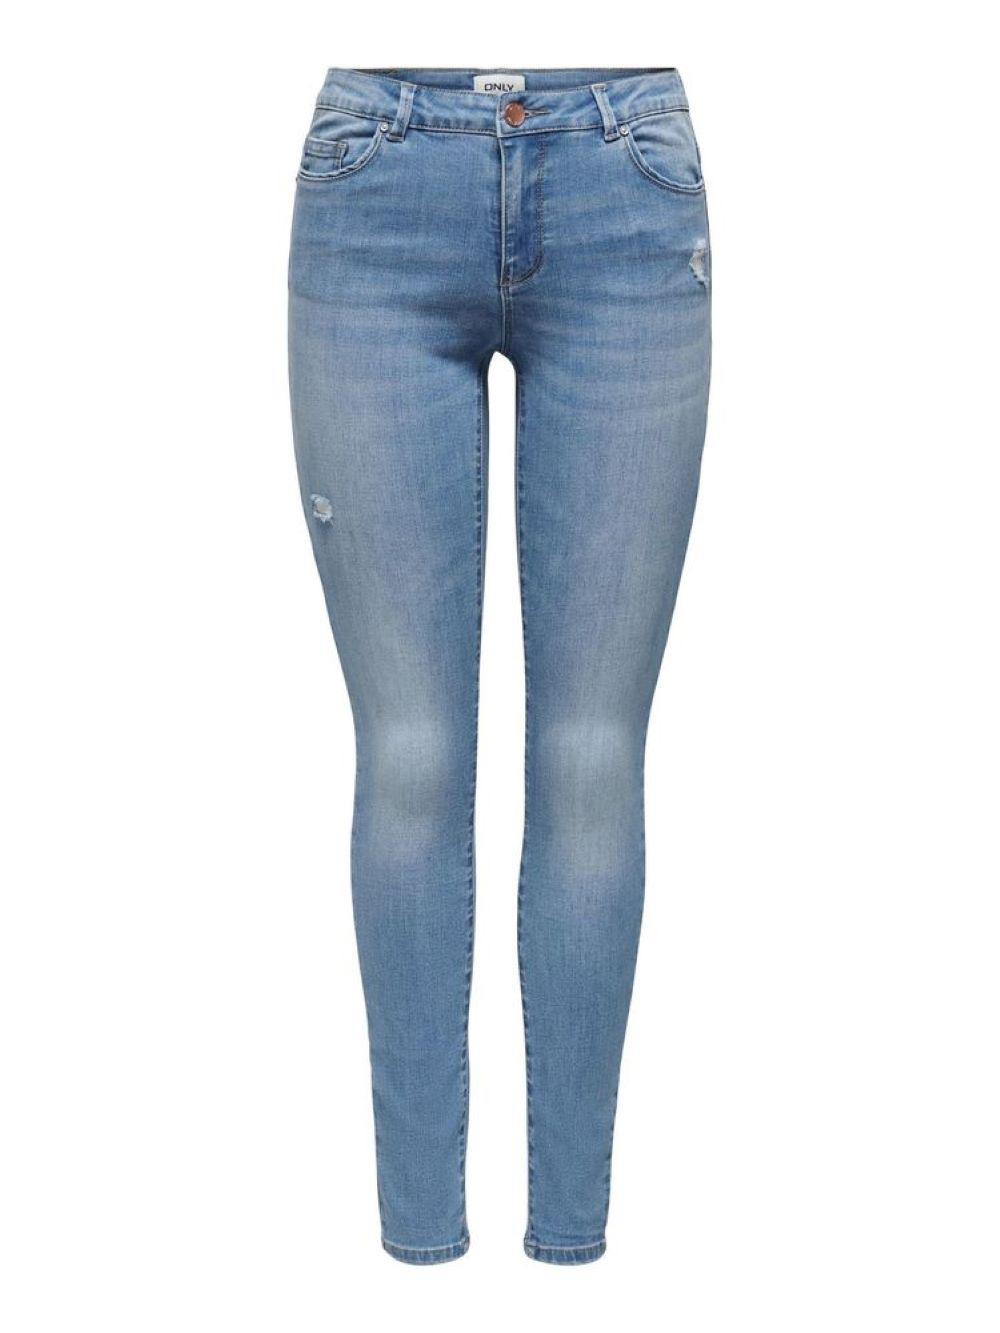 ONLWAUW LIFE LS MIDSK DEST BJ759 NOOS ONLY | Jeans | 15223165LIGHTMEDIUMBLUEDENIM